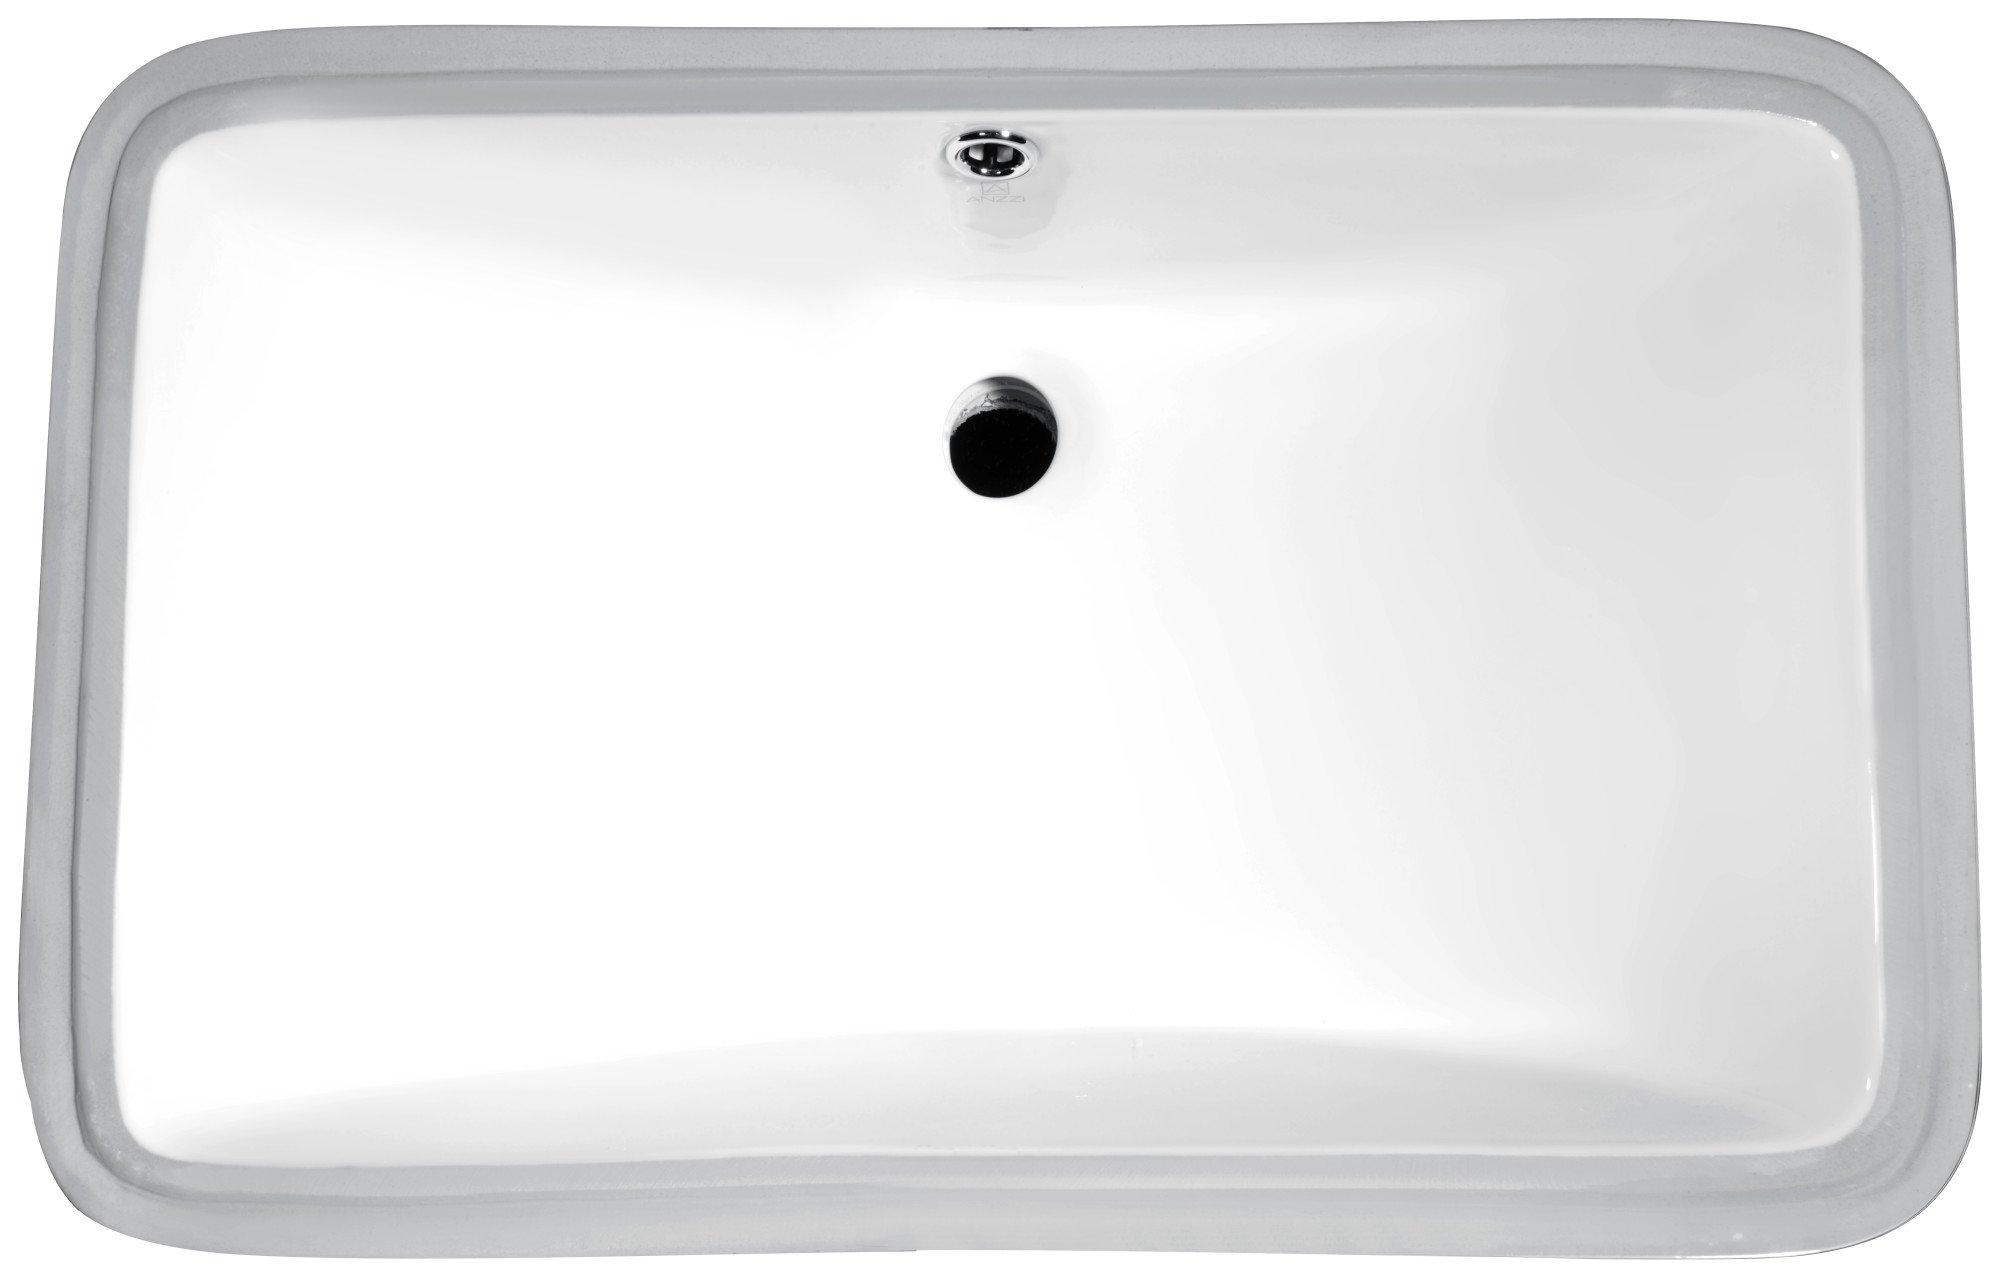 20.5'' Ceramic Undermount Sink - Glossy White - Dahlia Series LS-AZ113 - ANZZI